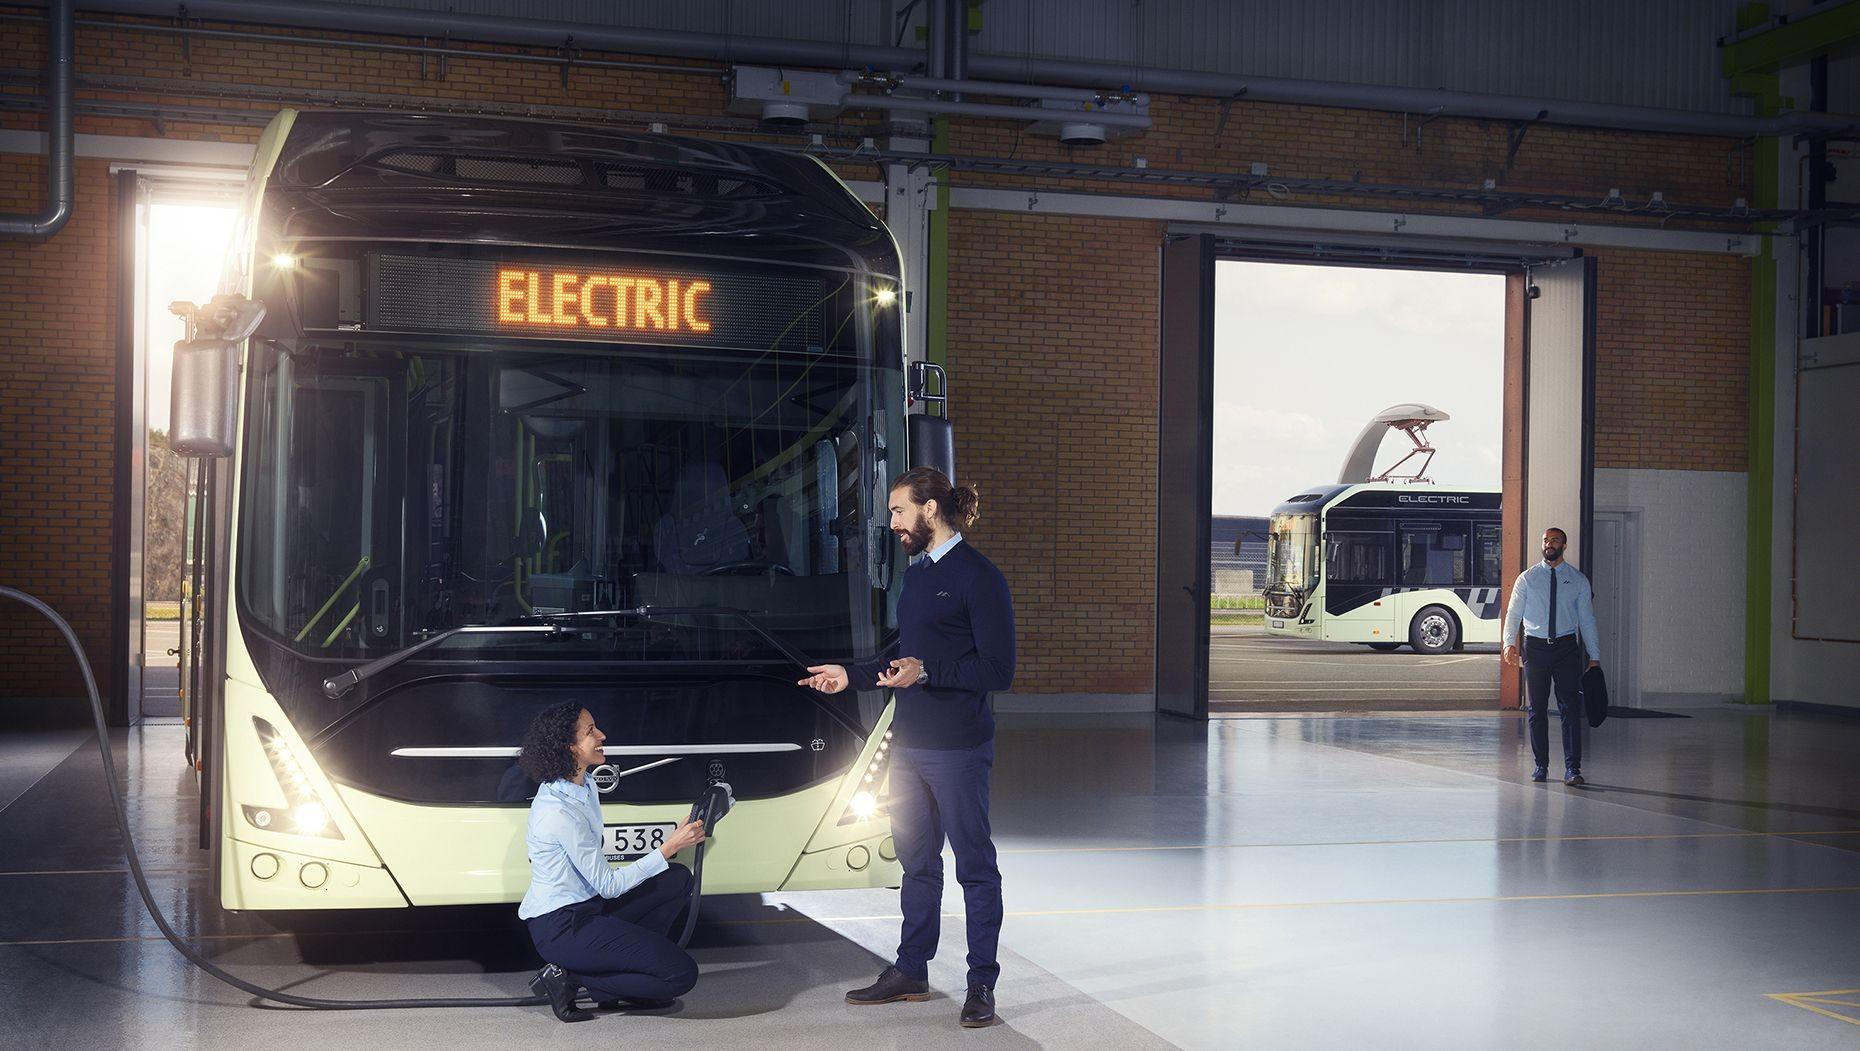 Вольво представила навсе 100% электрический автобус 7900 Electric